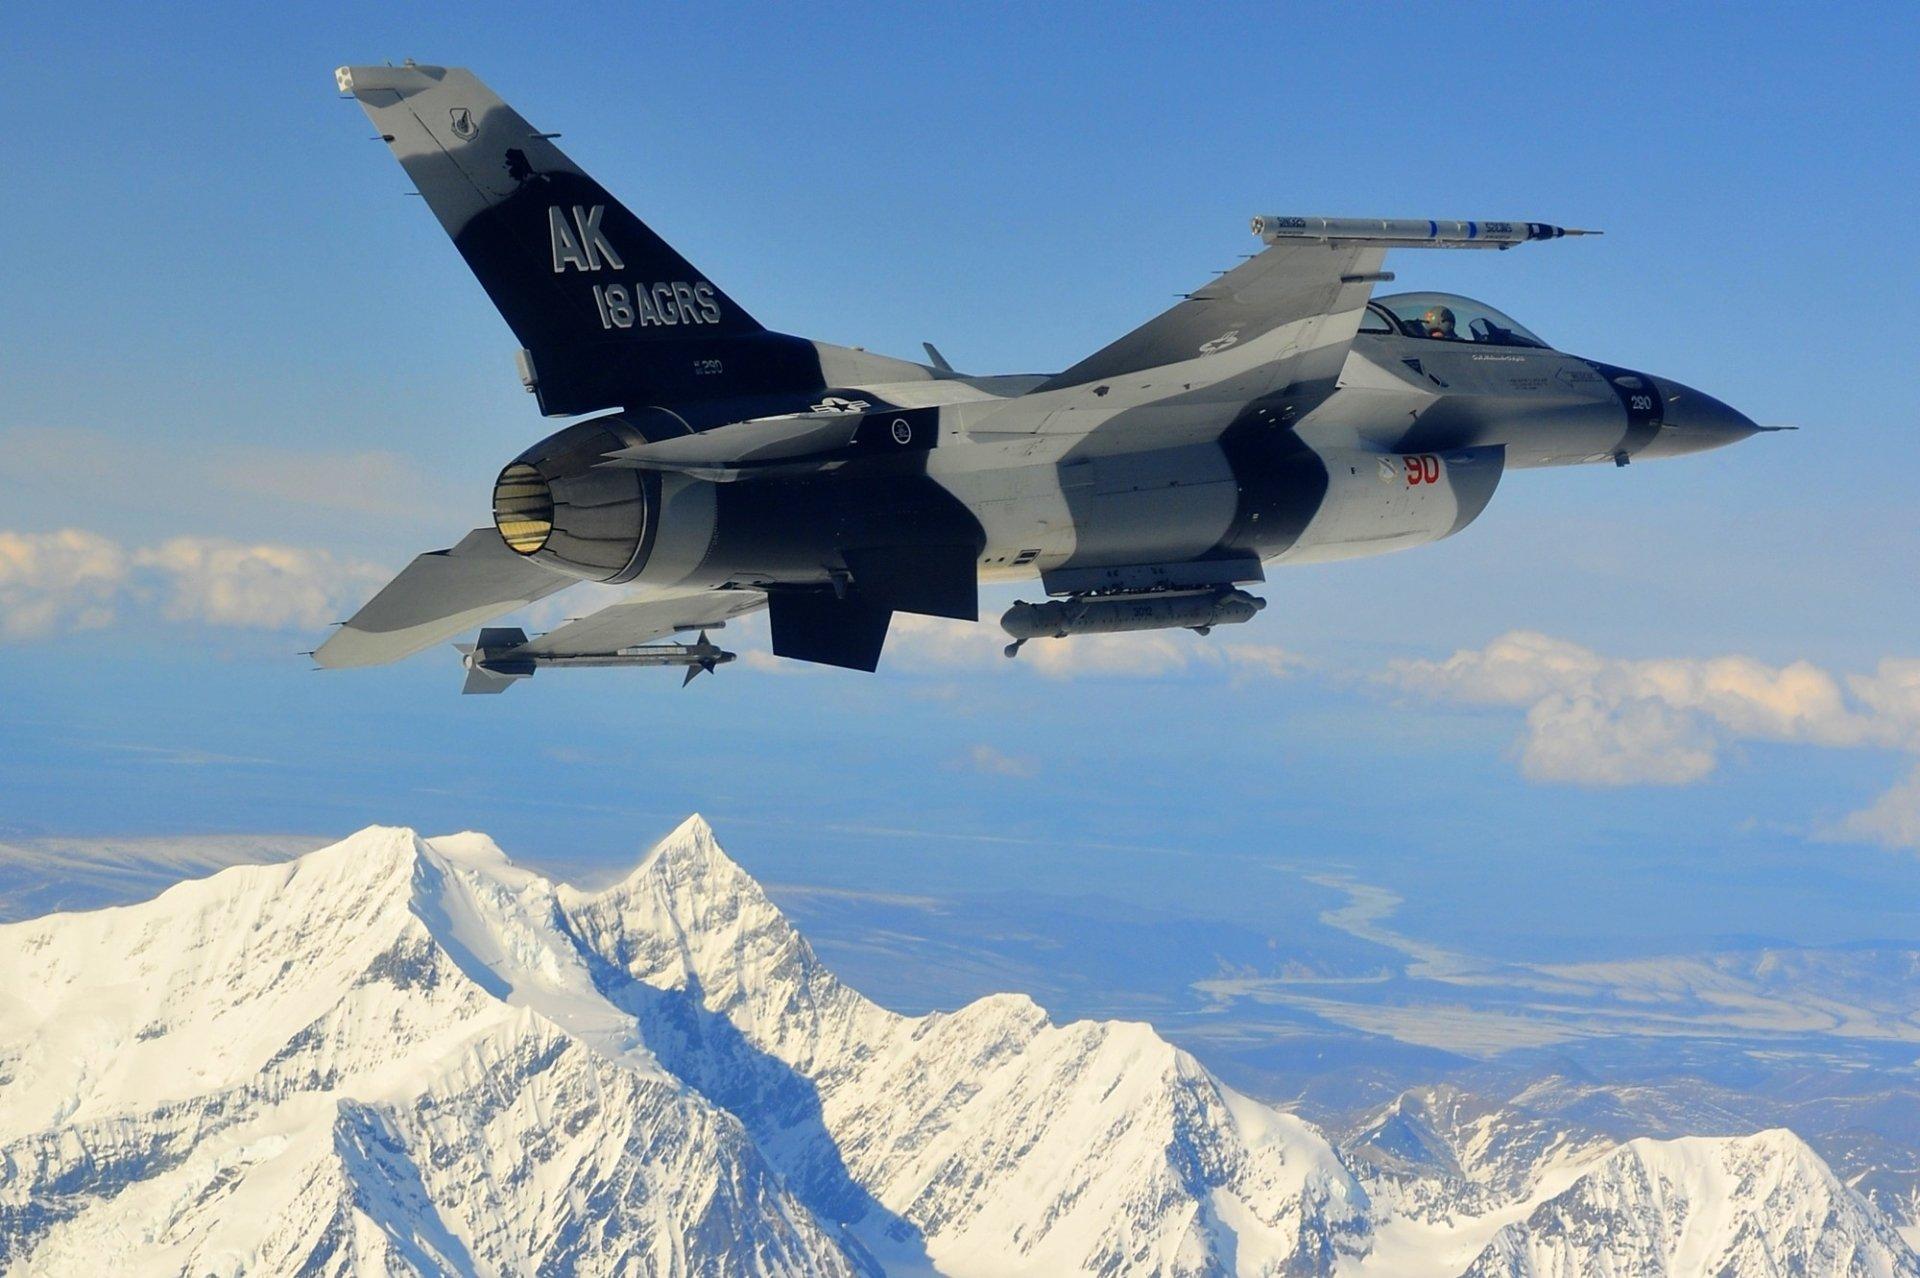 Military - General Dynamics F-16 Fighting Falcon  Wallpaper